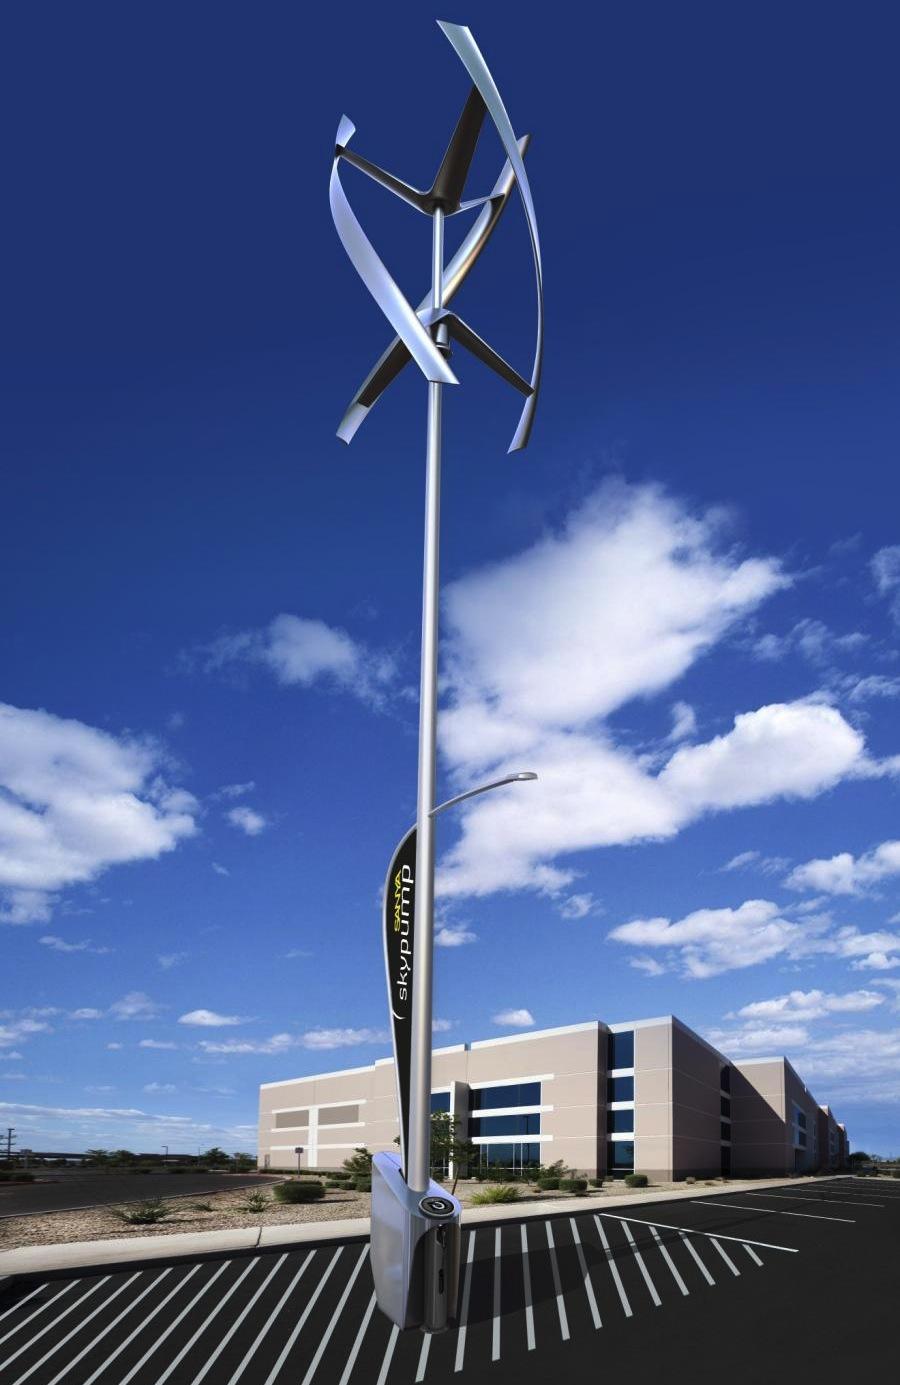 Sanya Skypump Wind Turbine Is Getting Set To Charge Evs